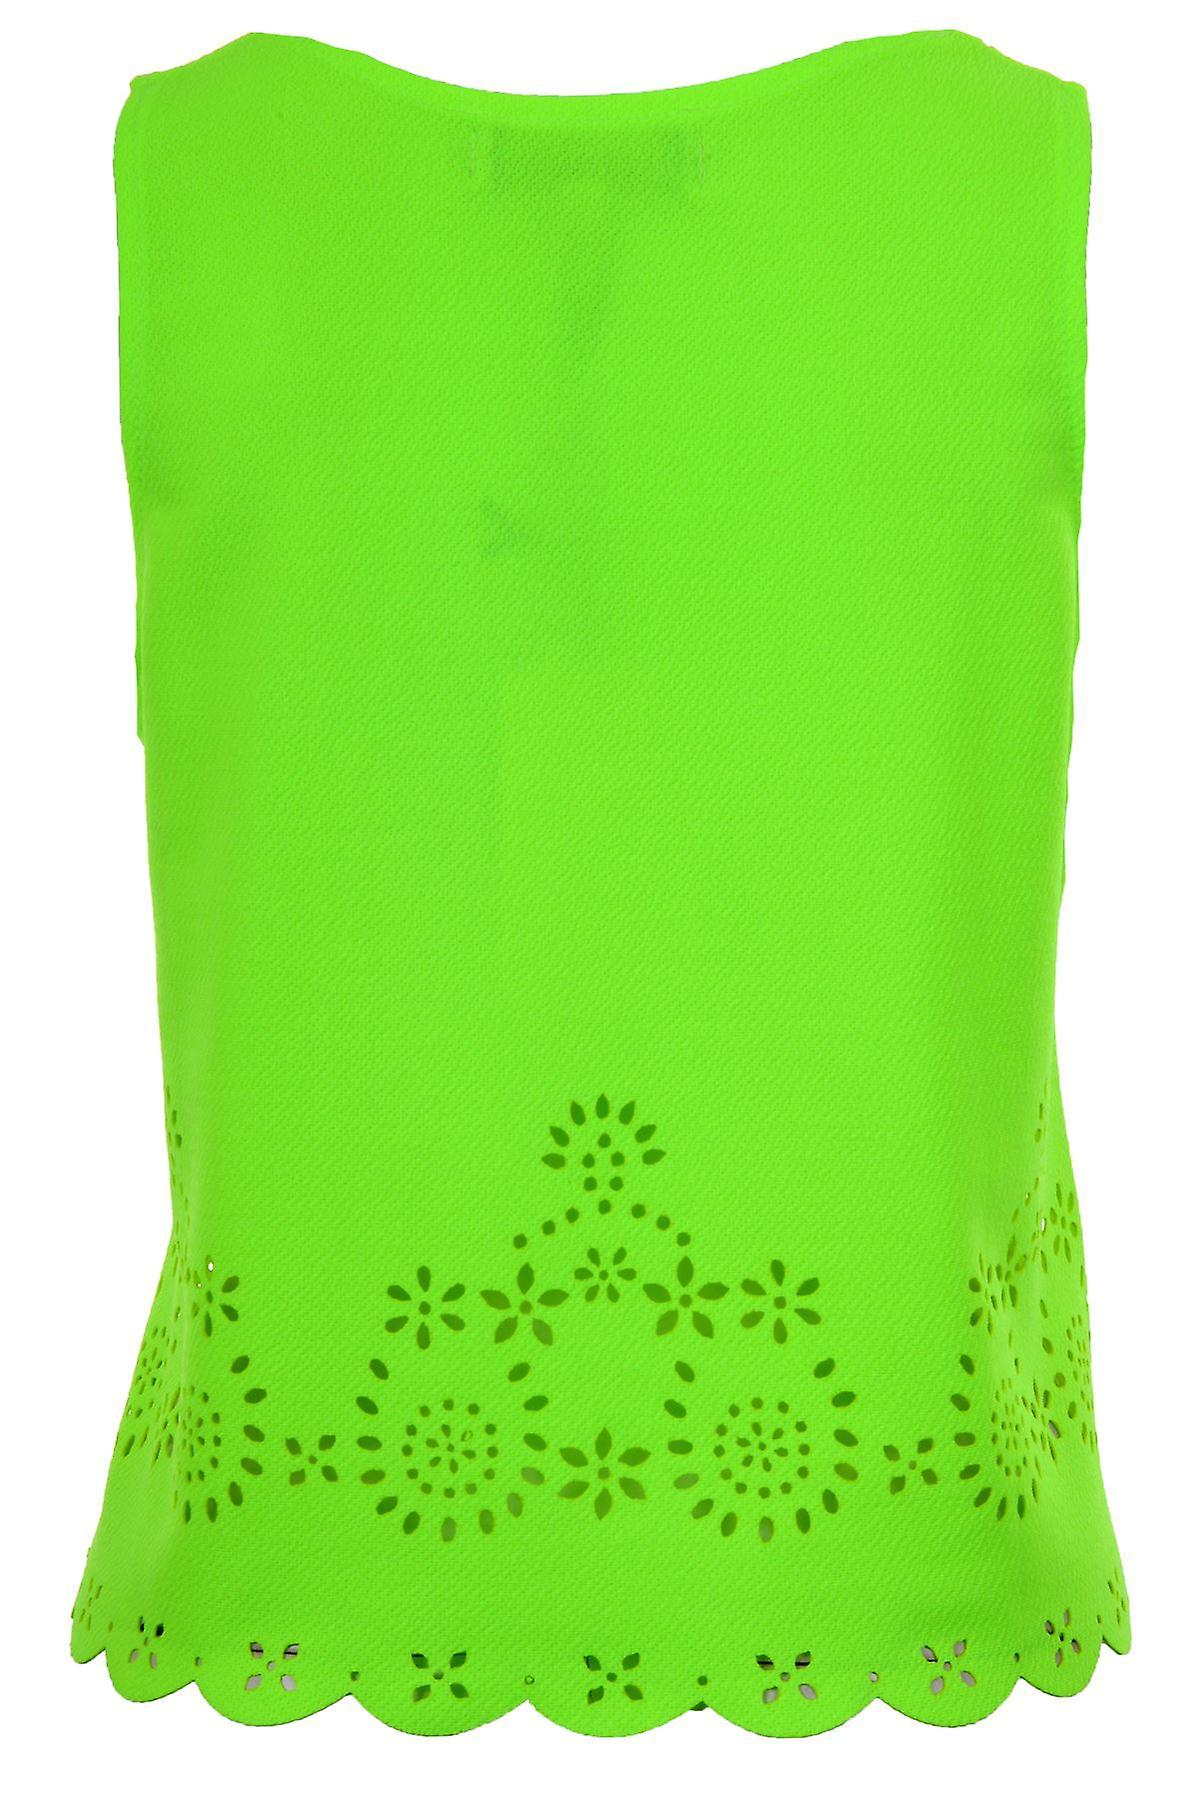 Women's Floral Cut Out Vest Ladies Sleeveless Scallop Hem Trim Summer Top